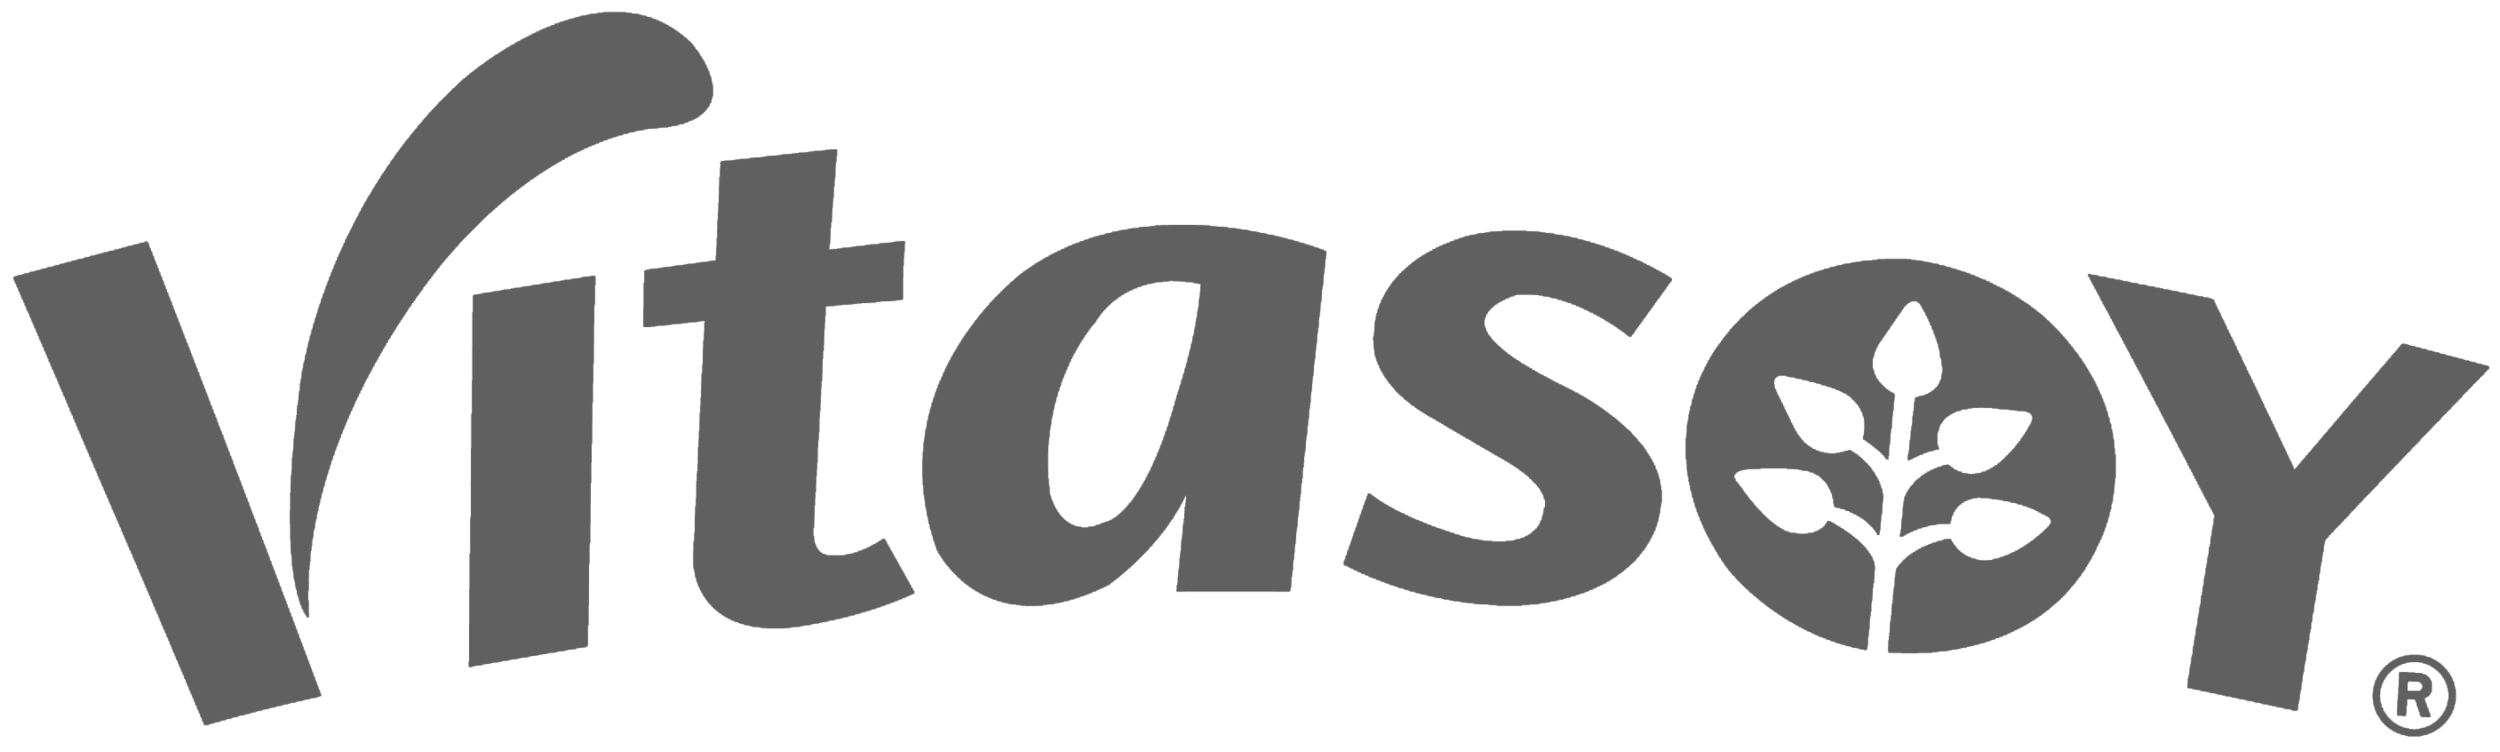 Vitasoy Corp Logo-PMS 185 High Res.png